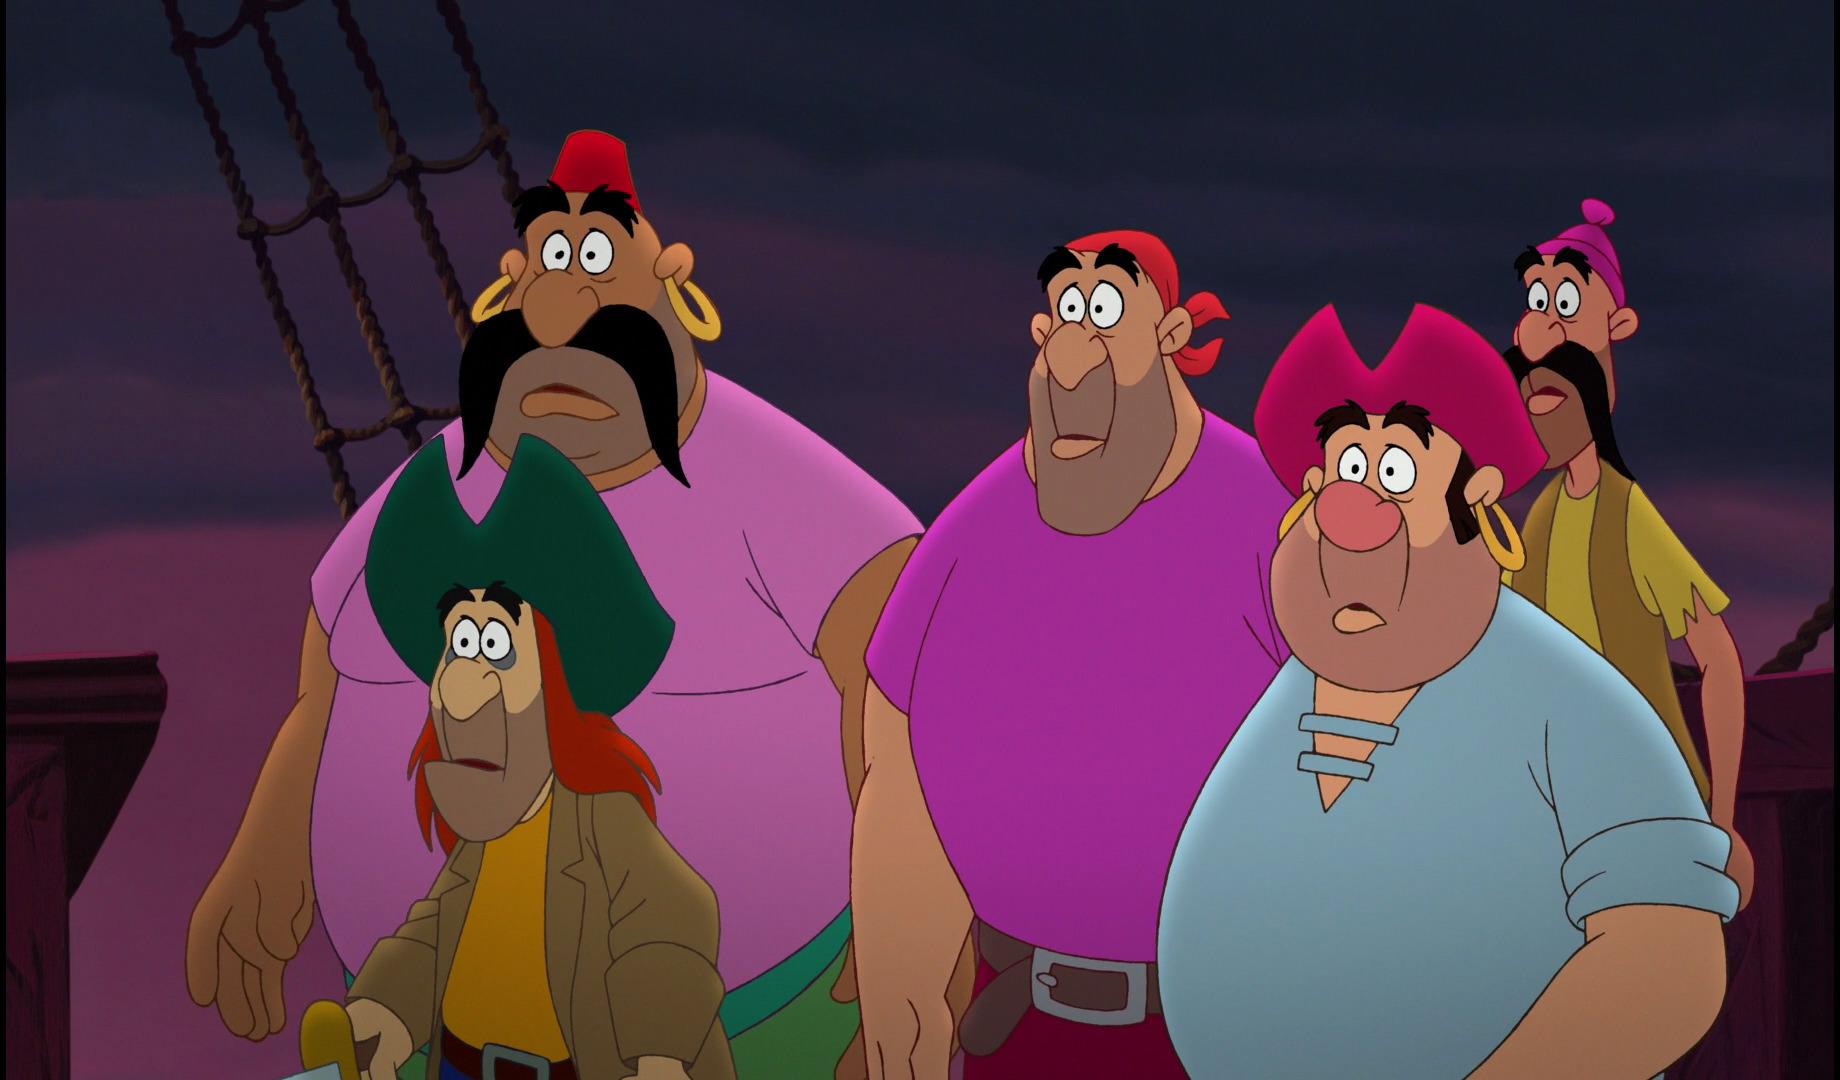 Neverland pirates villains wiki fandom powered by wikia - Monsieur pirate ...